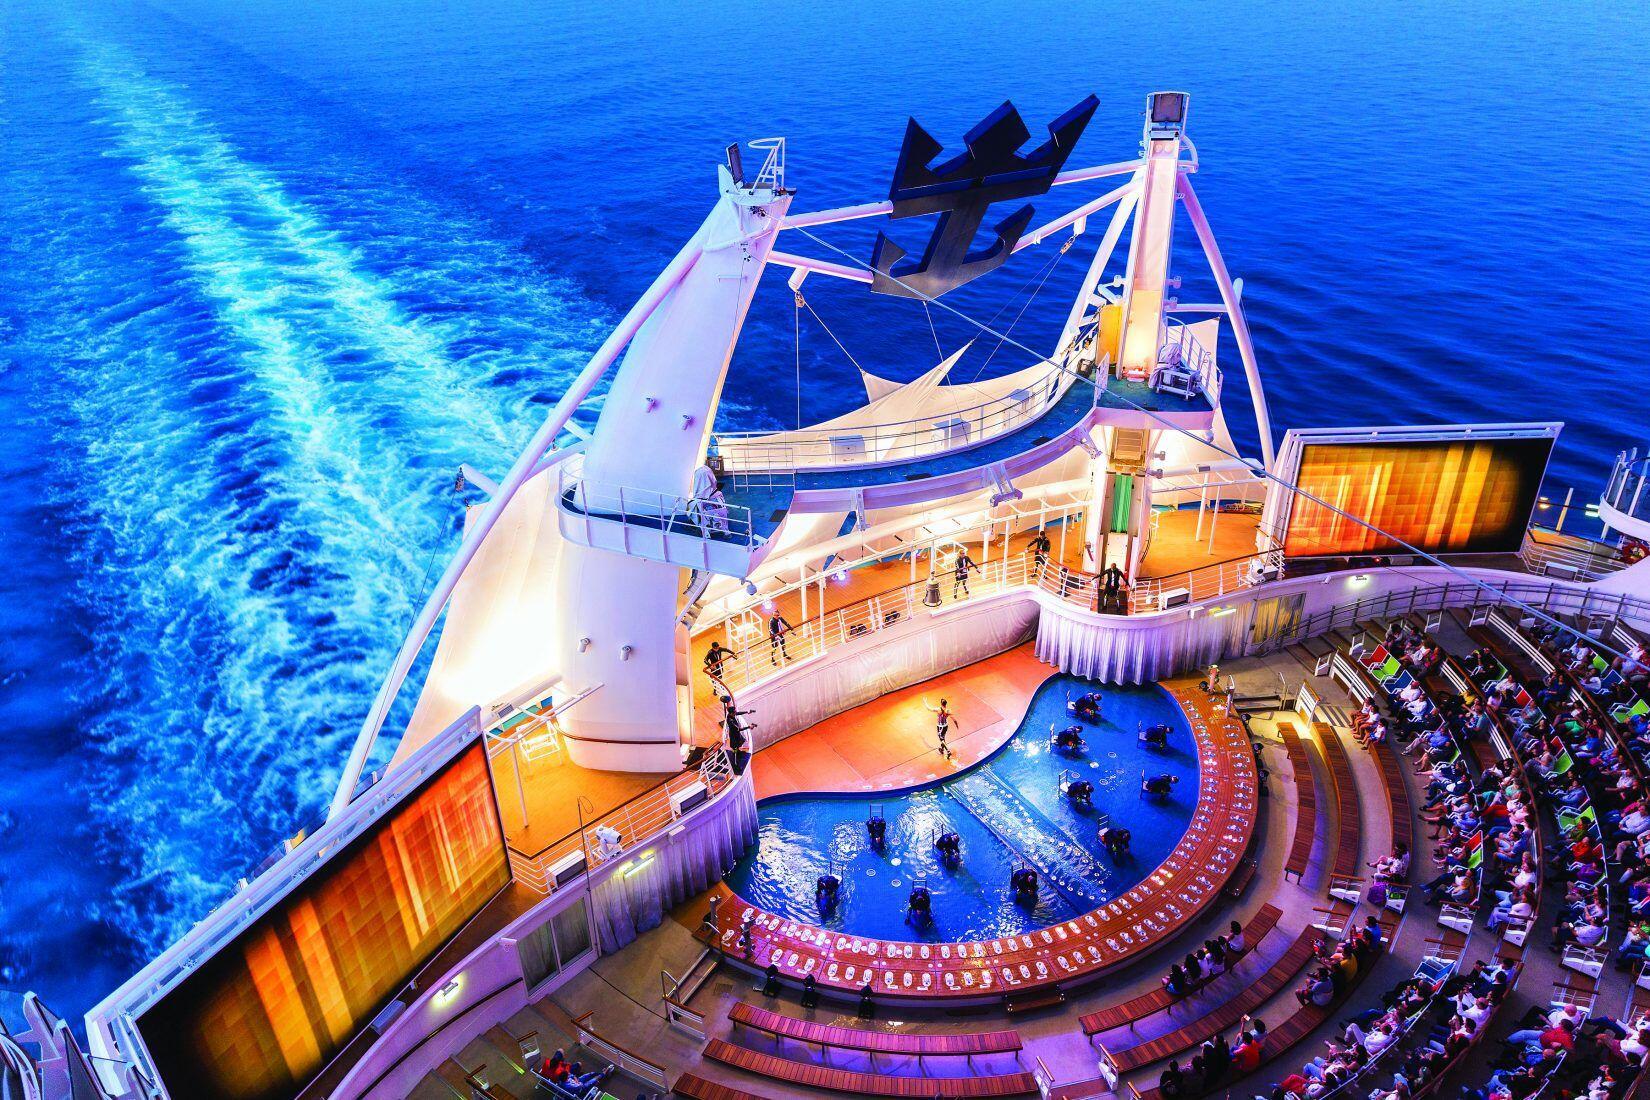 Yuk Intip 14 Potret Kemewahan Kapal Pesiar Symphony Of The Seas Ini!